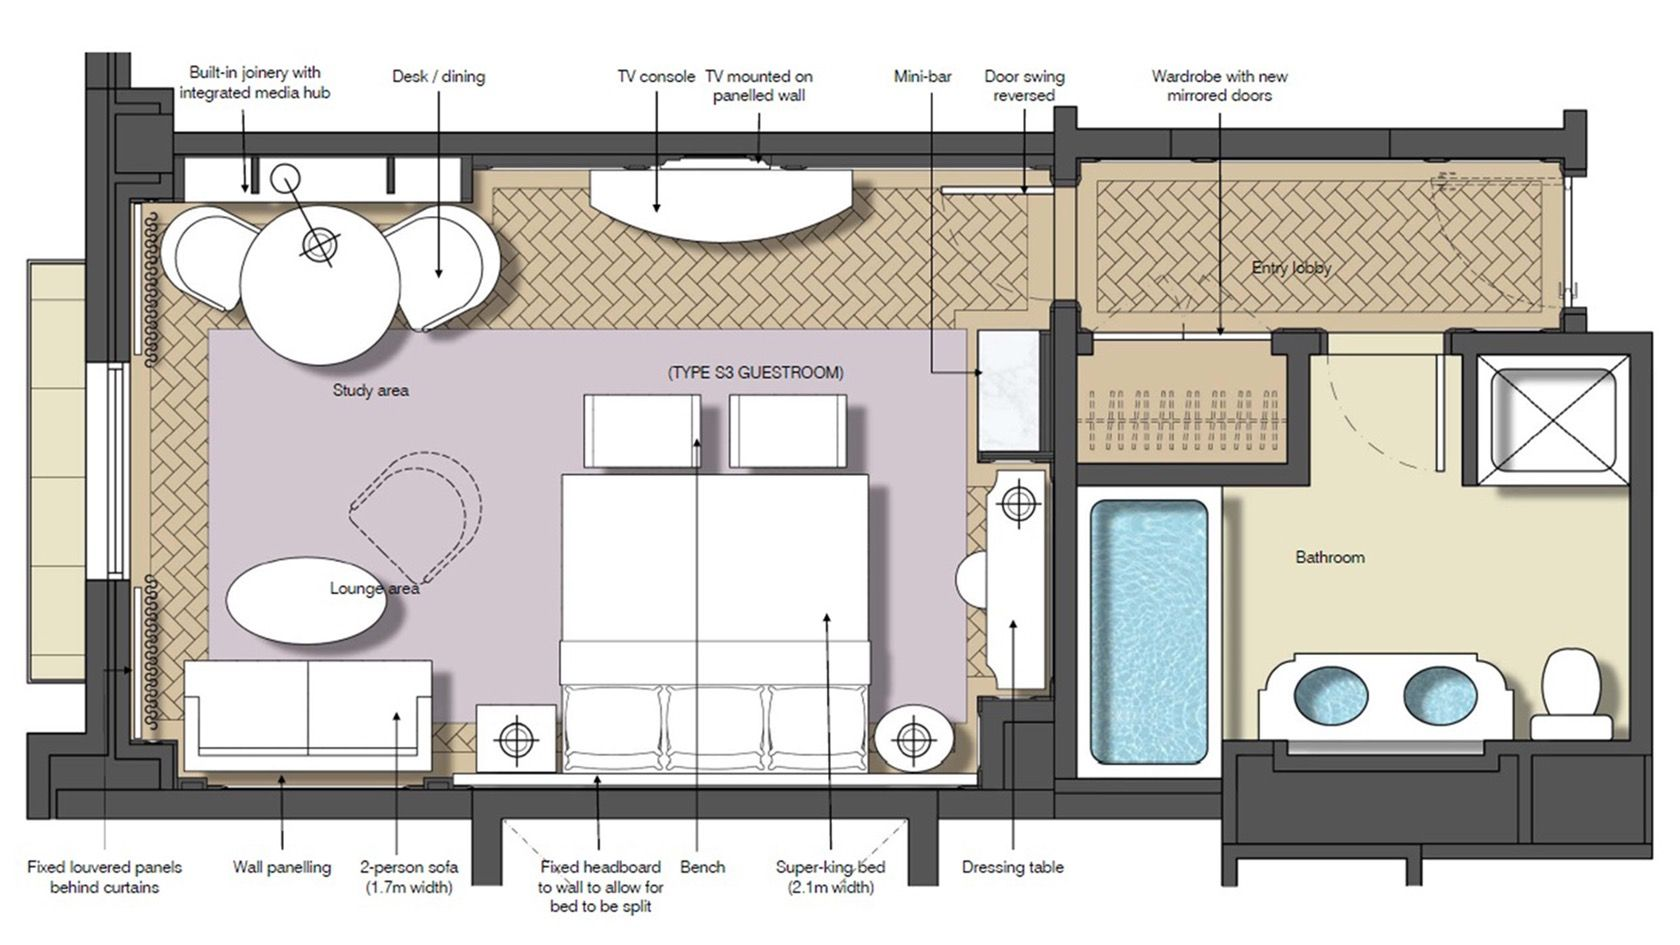 The Langham Sydney Deluxe Room Hotel Room Design Plan Hotel Room Design Luxury Hotel Room